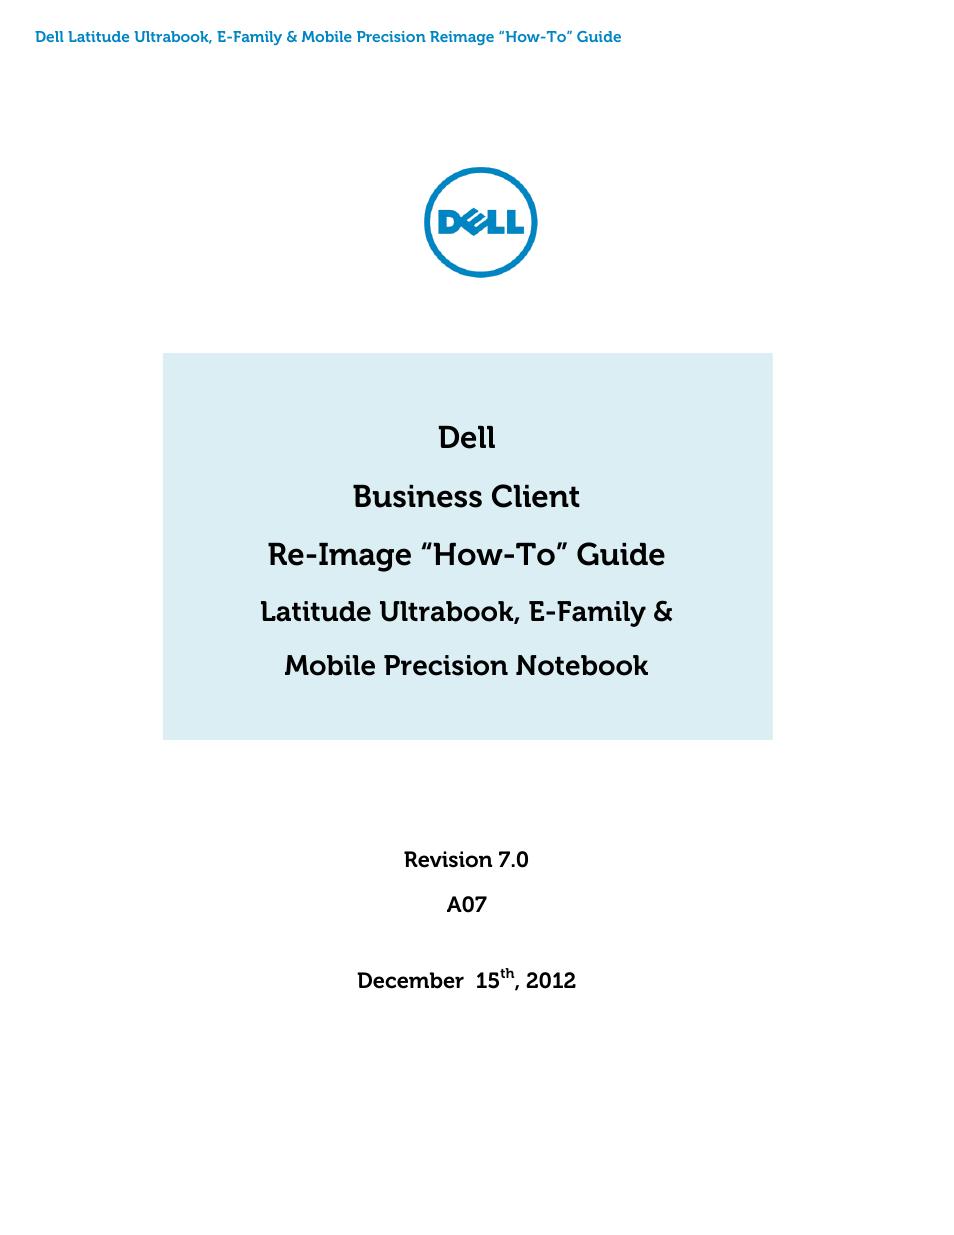 Dell Latitude E6430 (Mid 2012) User Manual   46 pages